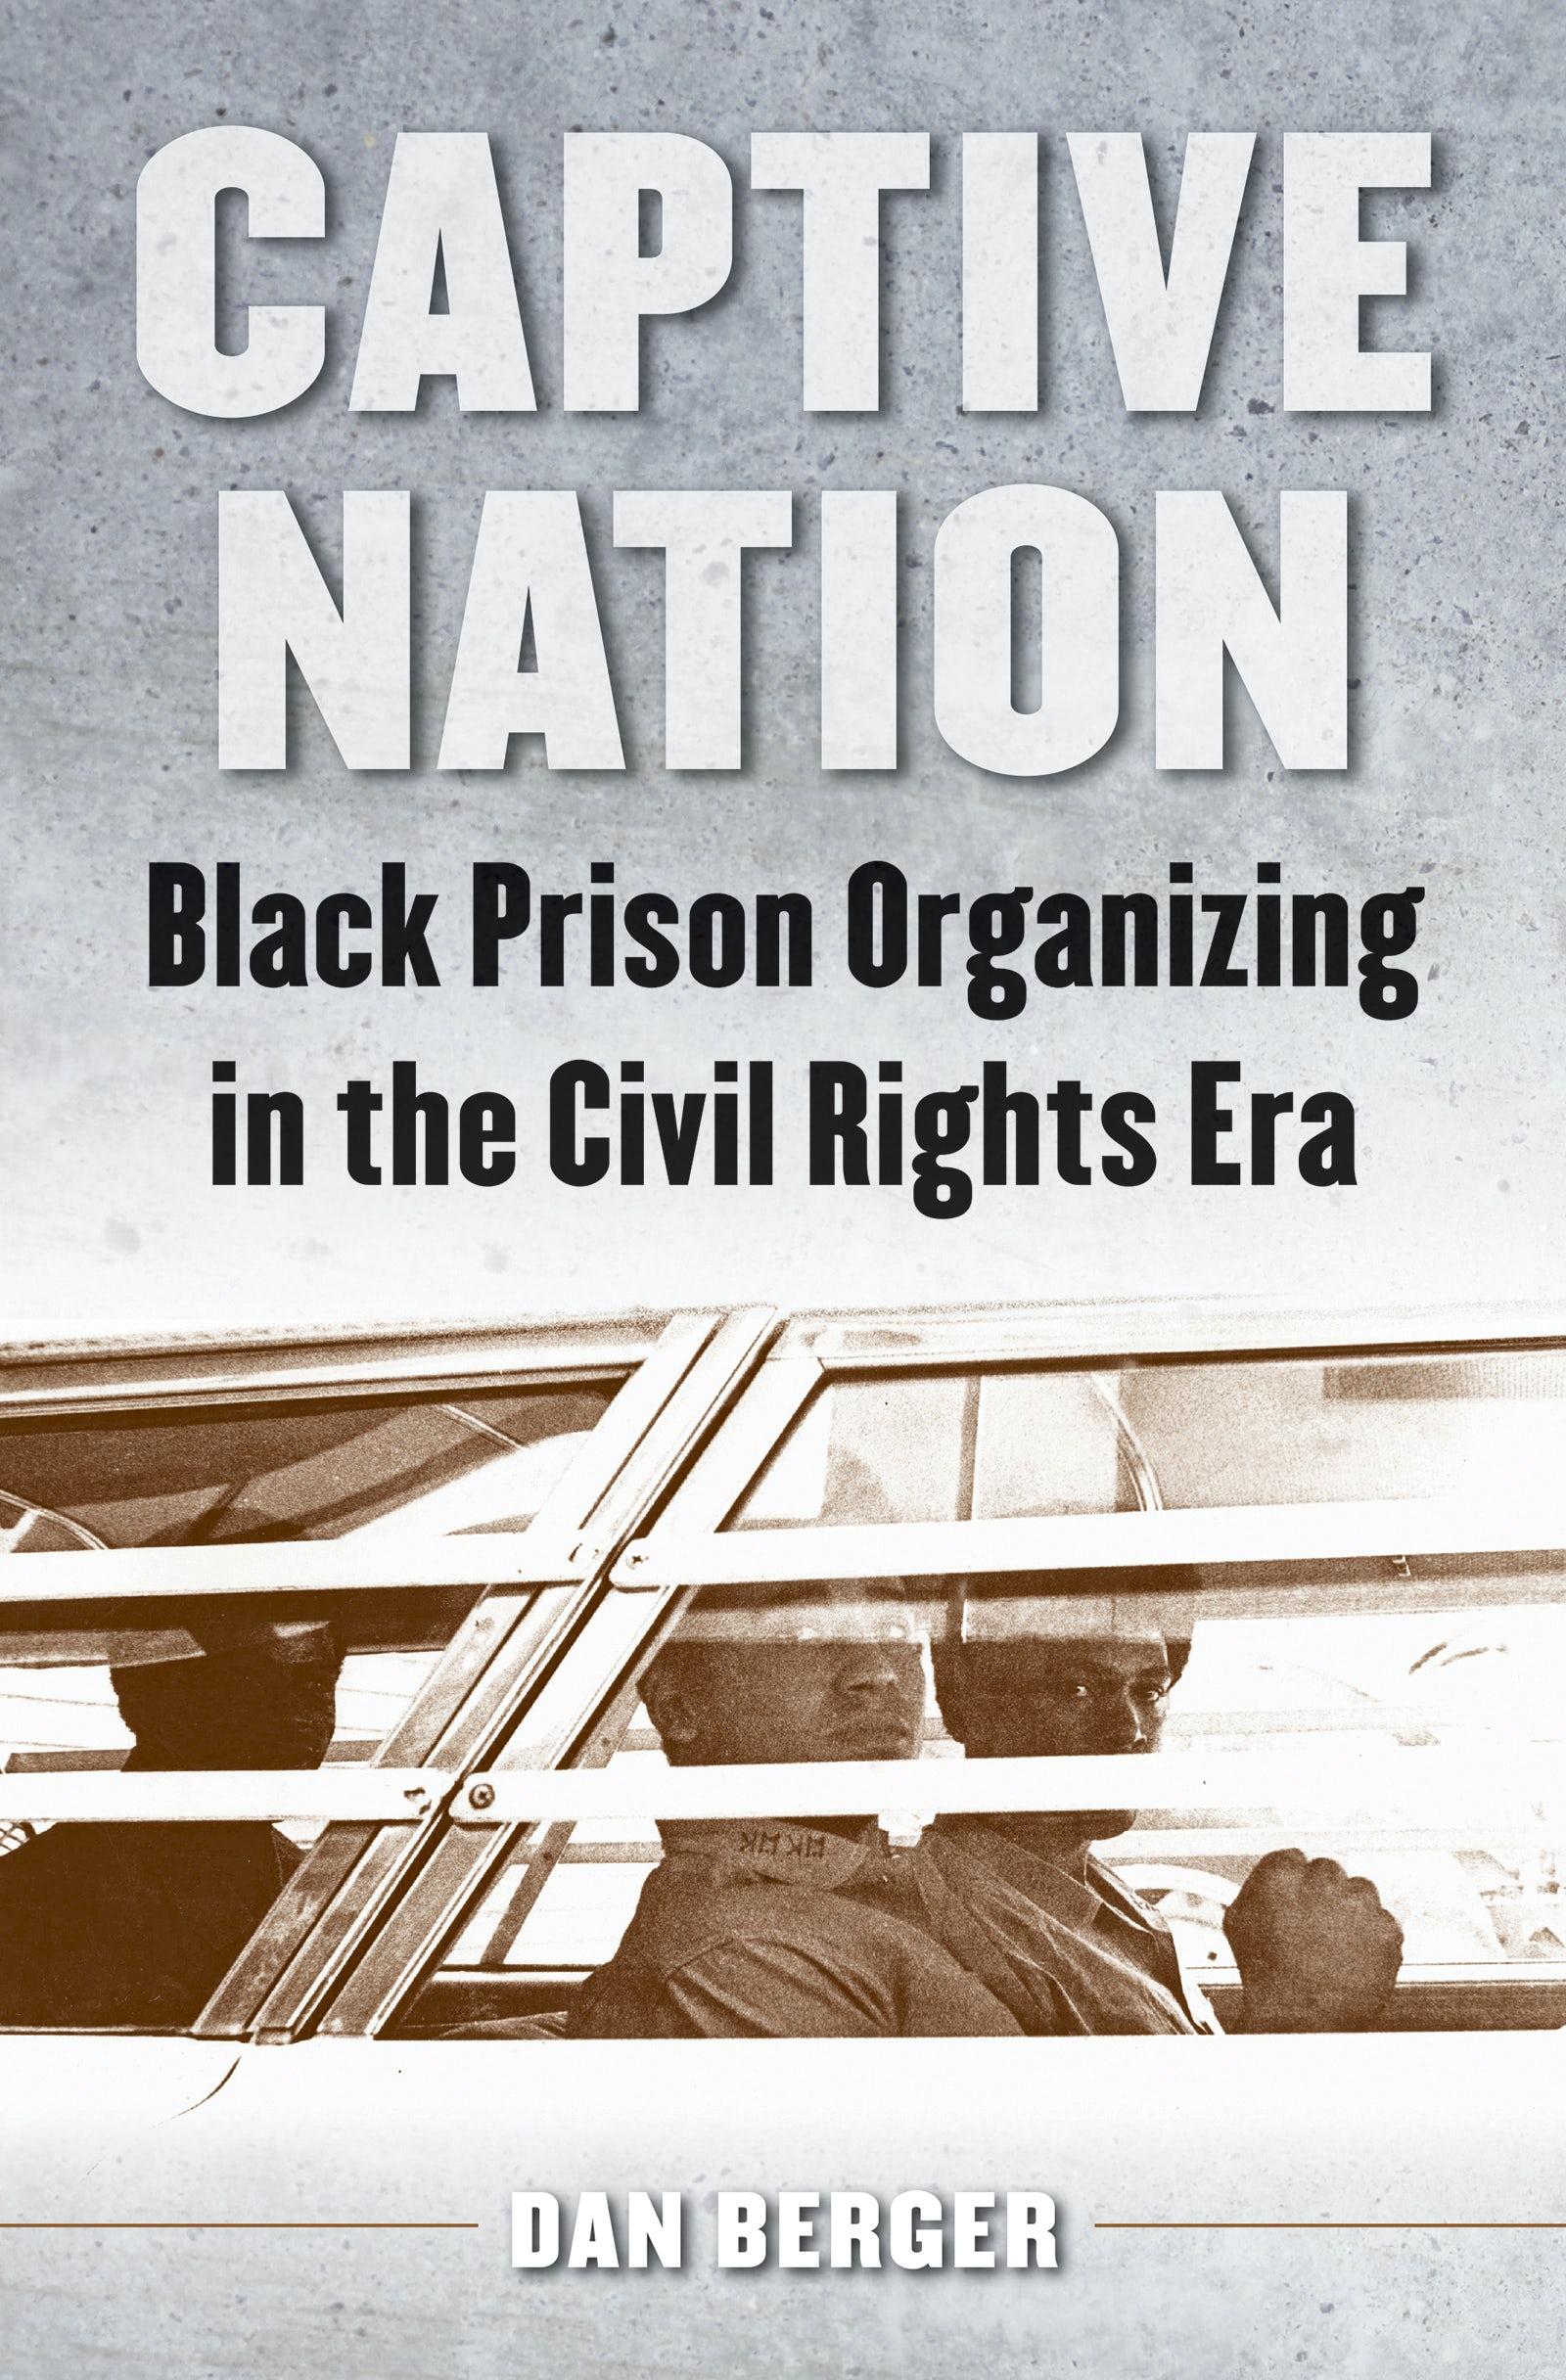 Captive Nation (2014, University of North Carolina Press)